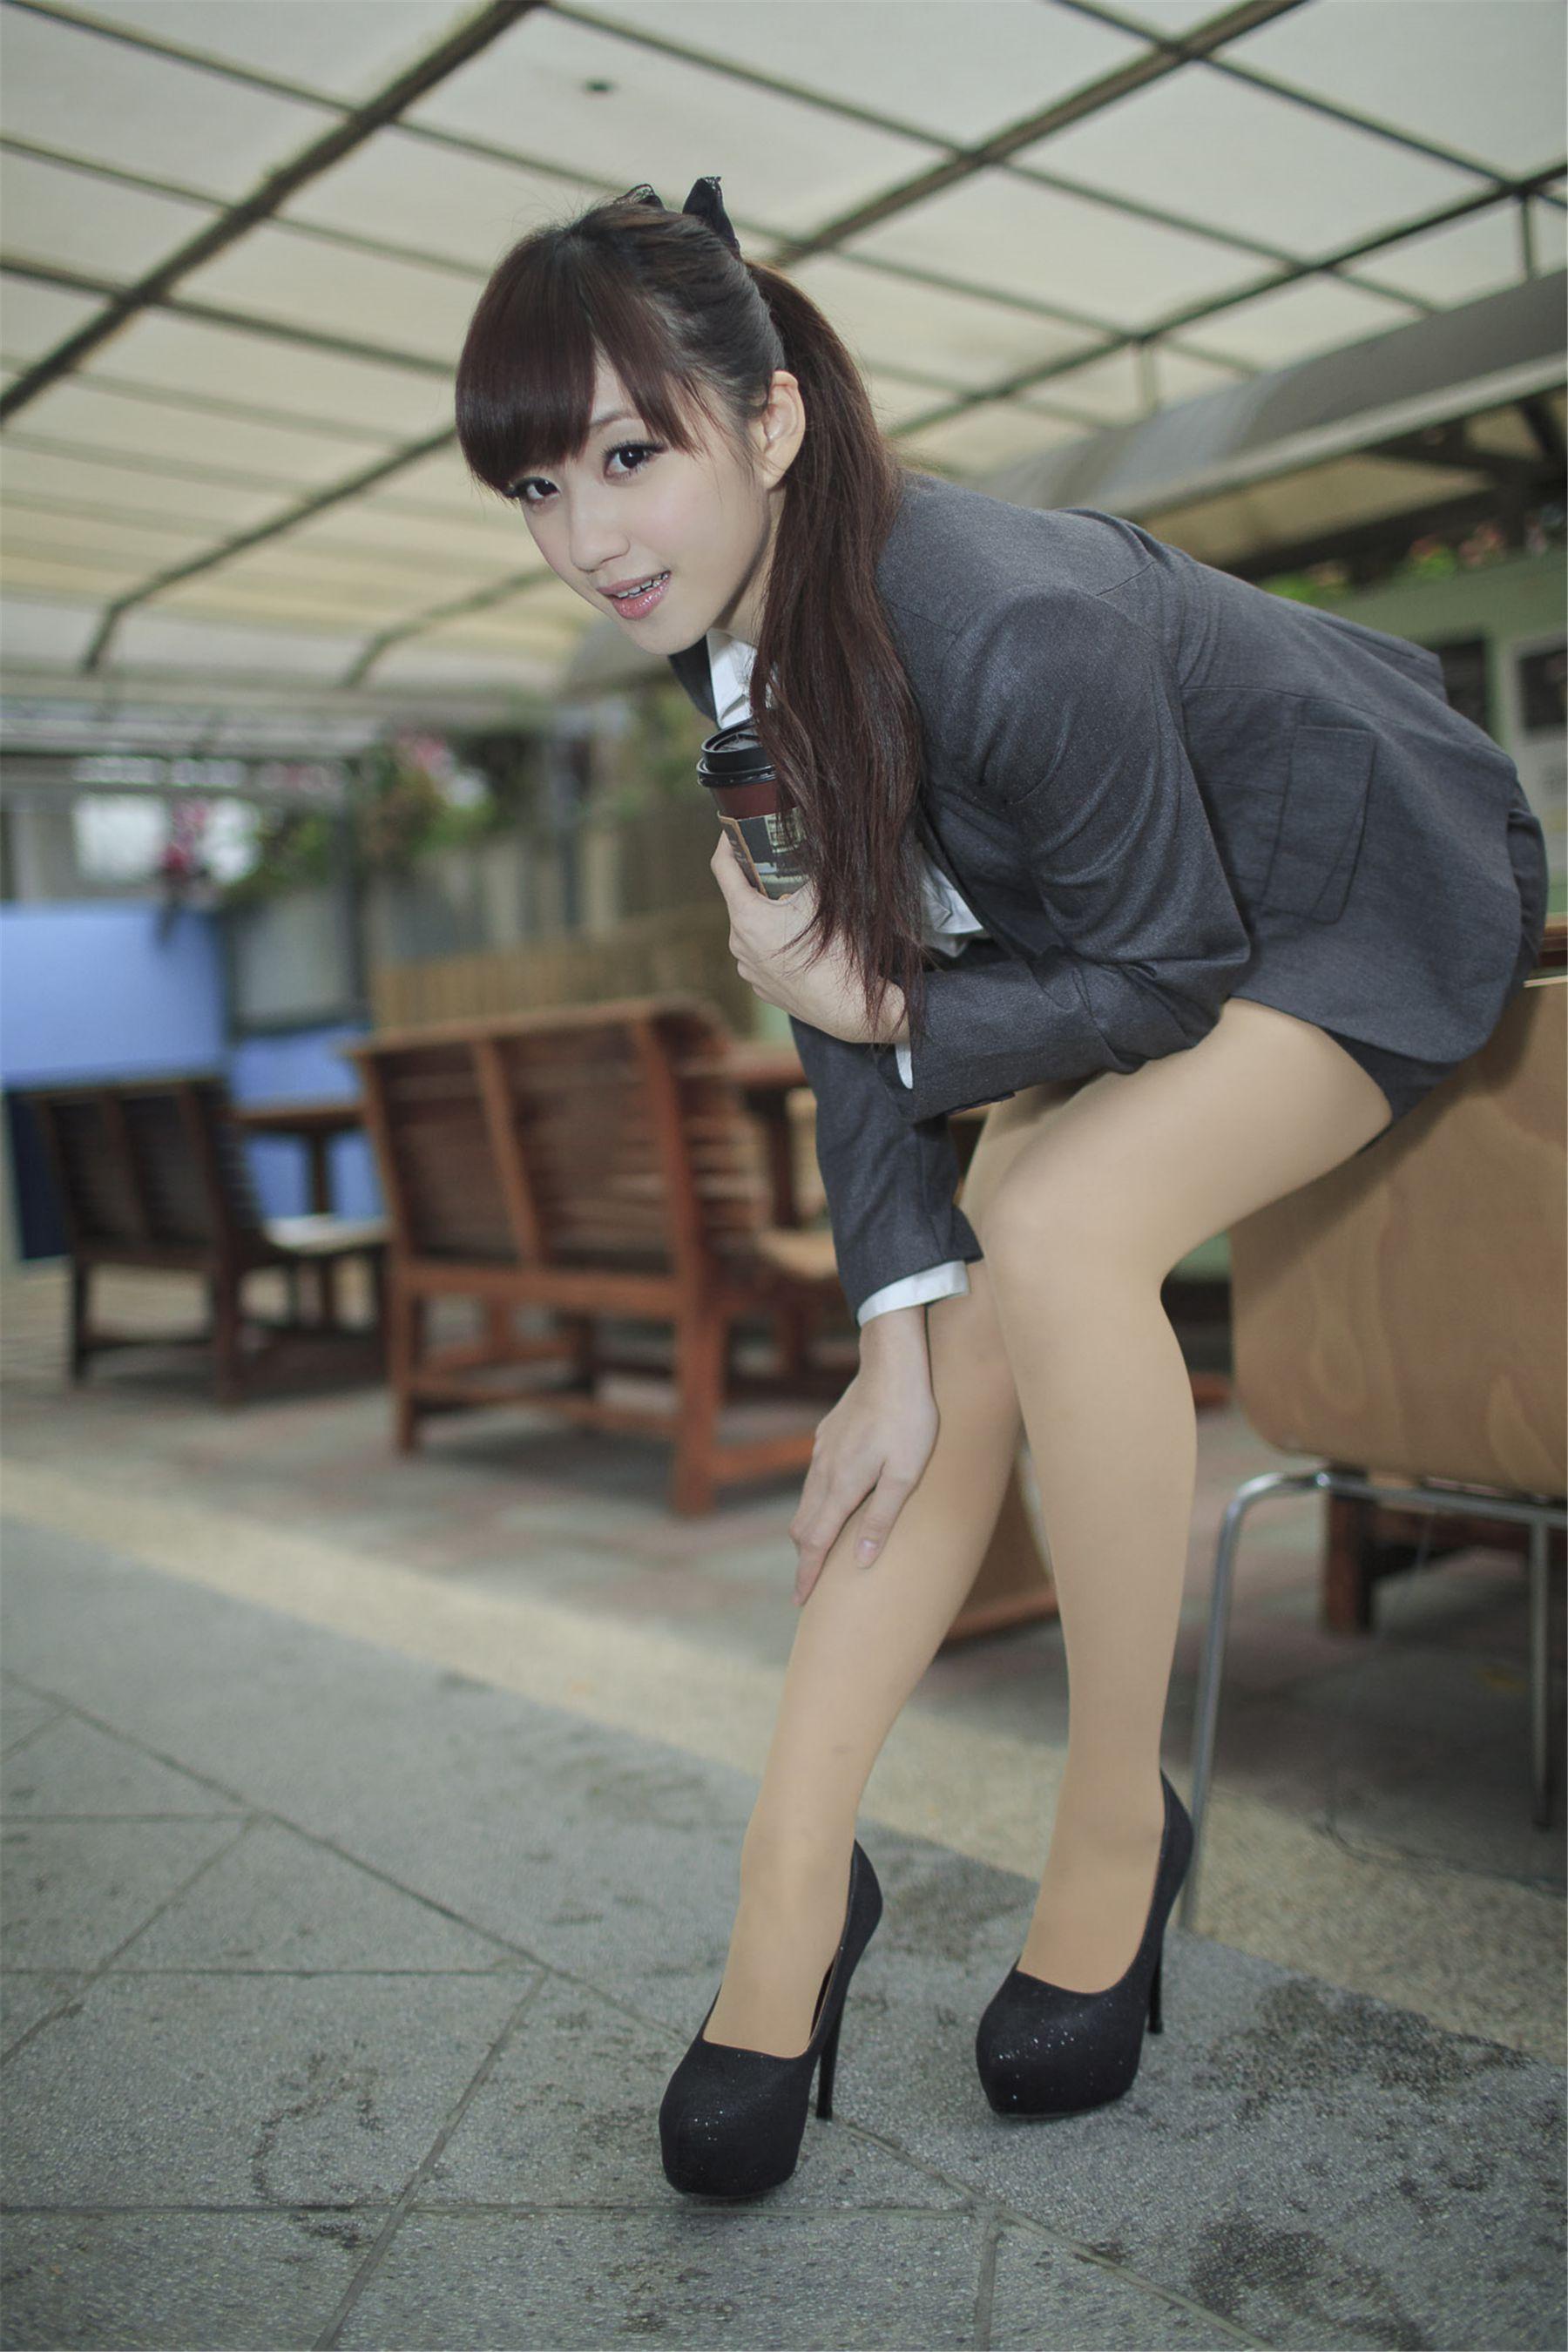 VOL.839 [台湾正妹]制服街拍清纯护士制服:小雅高品质写真套图(17P)